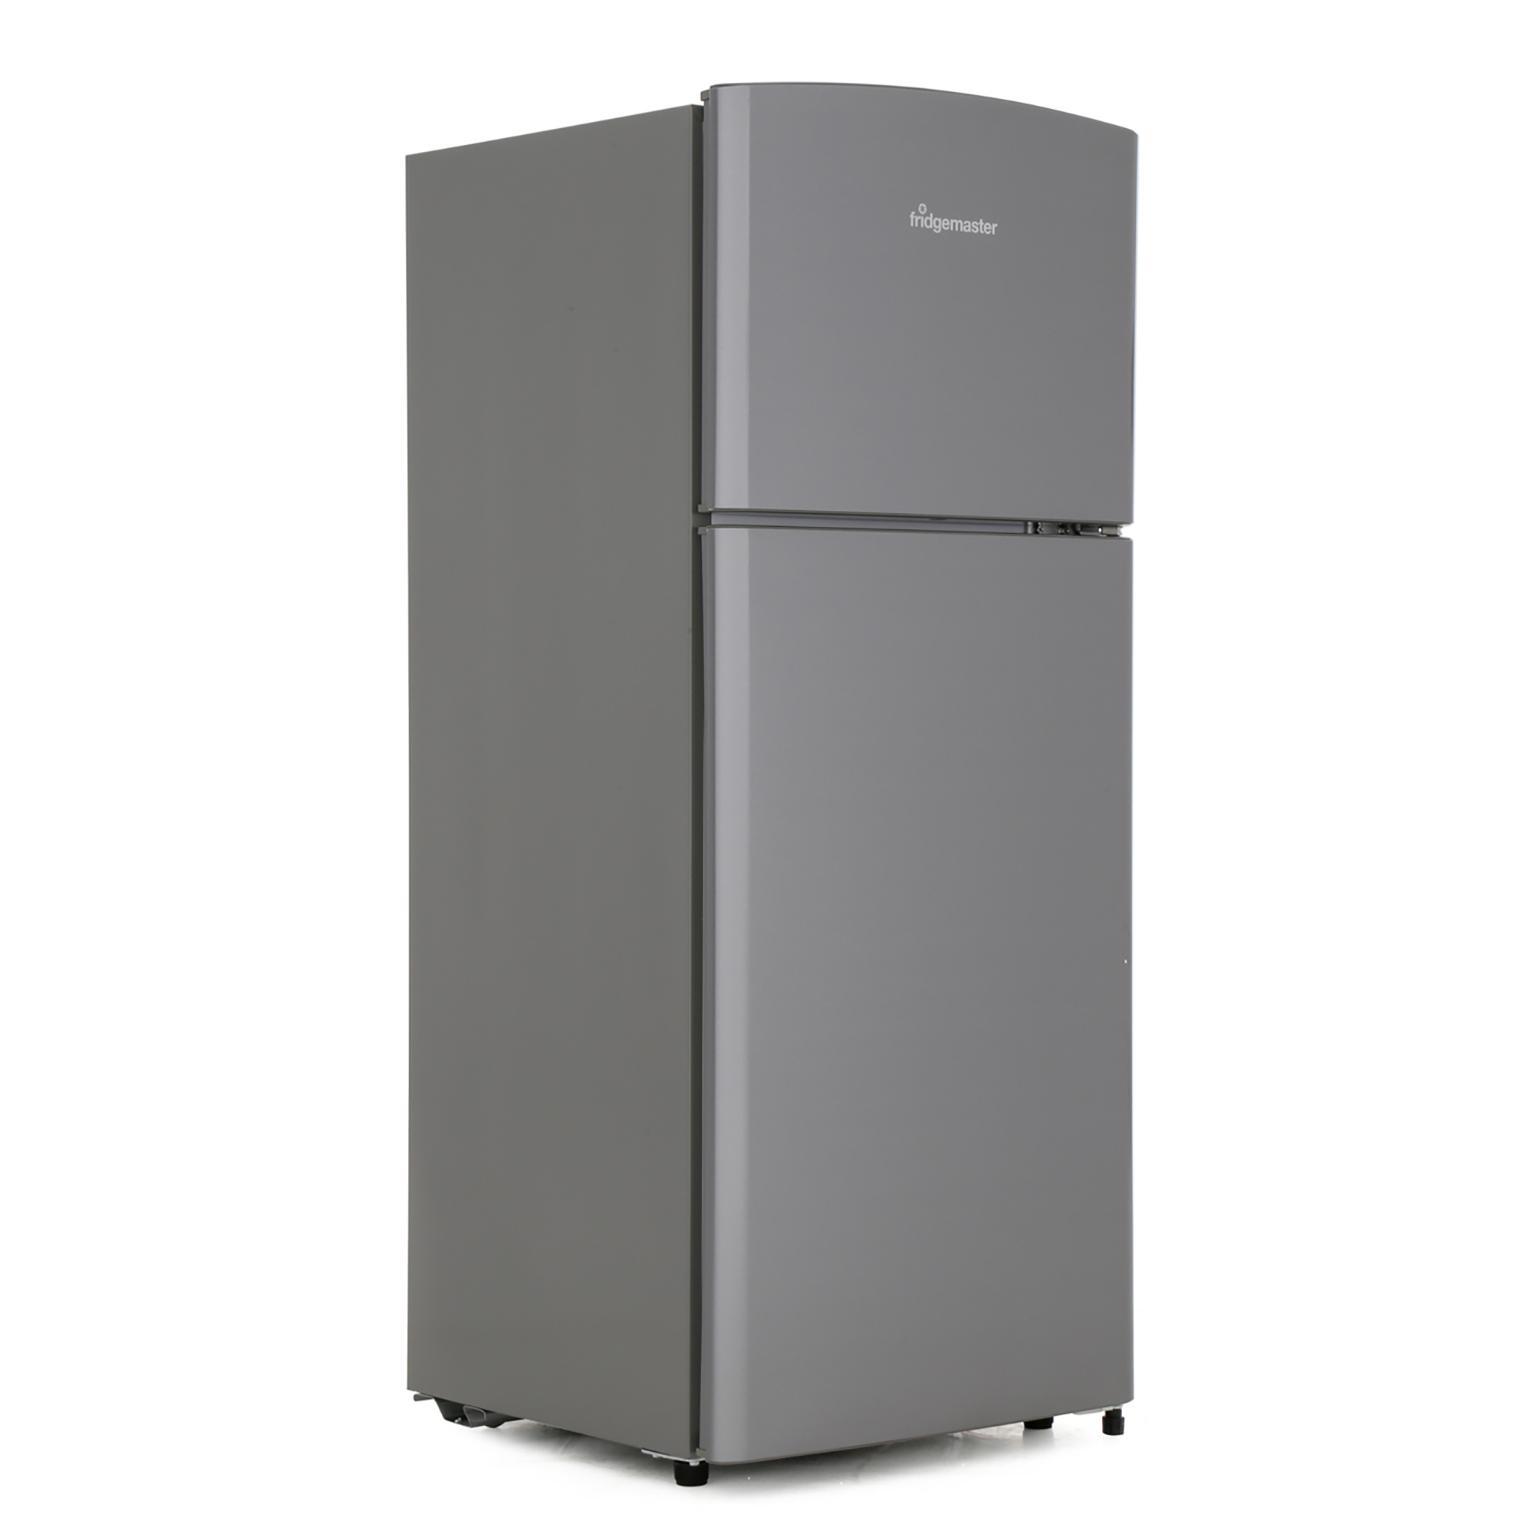 Fridgemaster MTM48120S Fridge Freezer